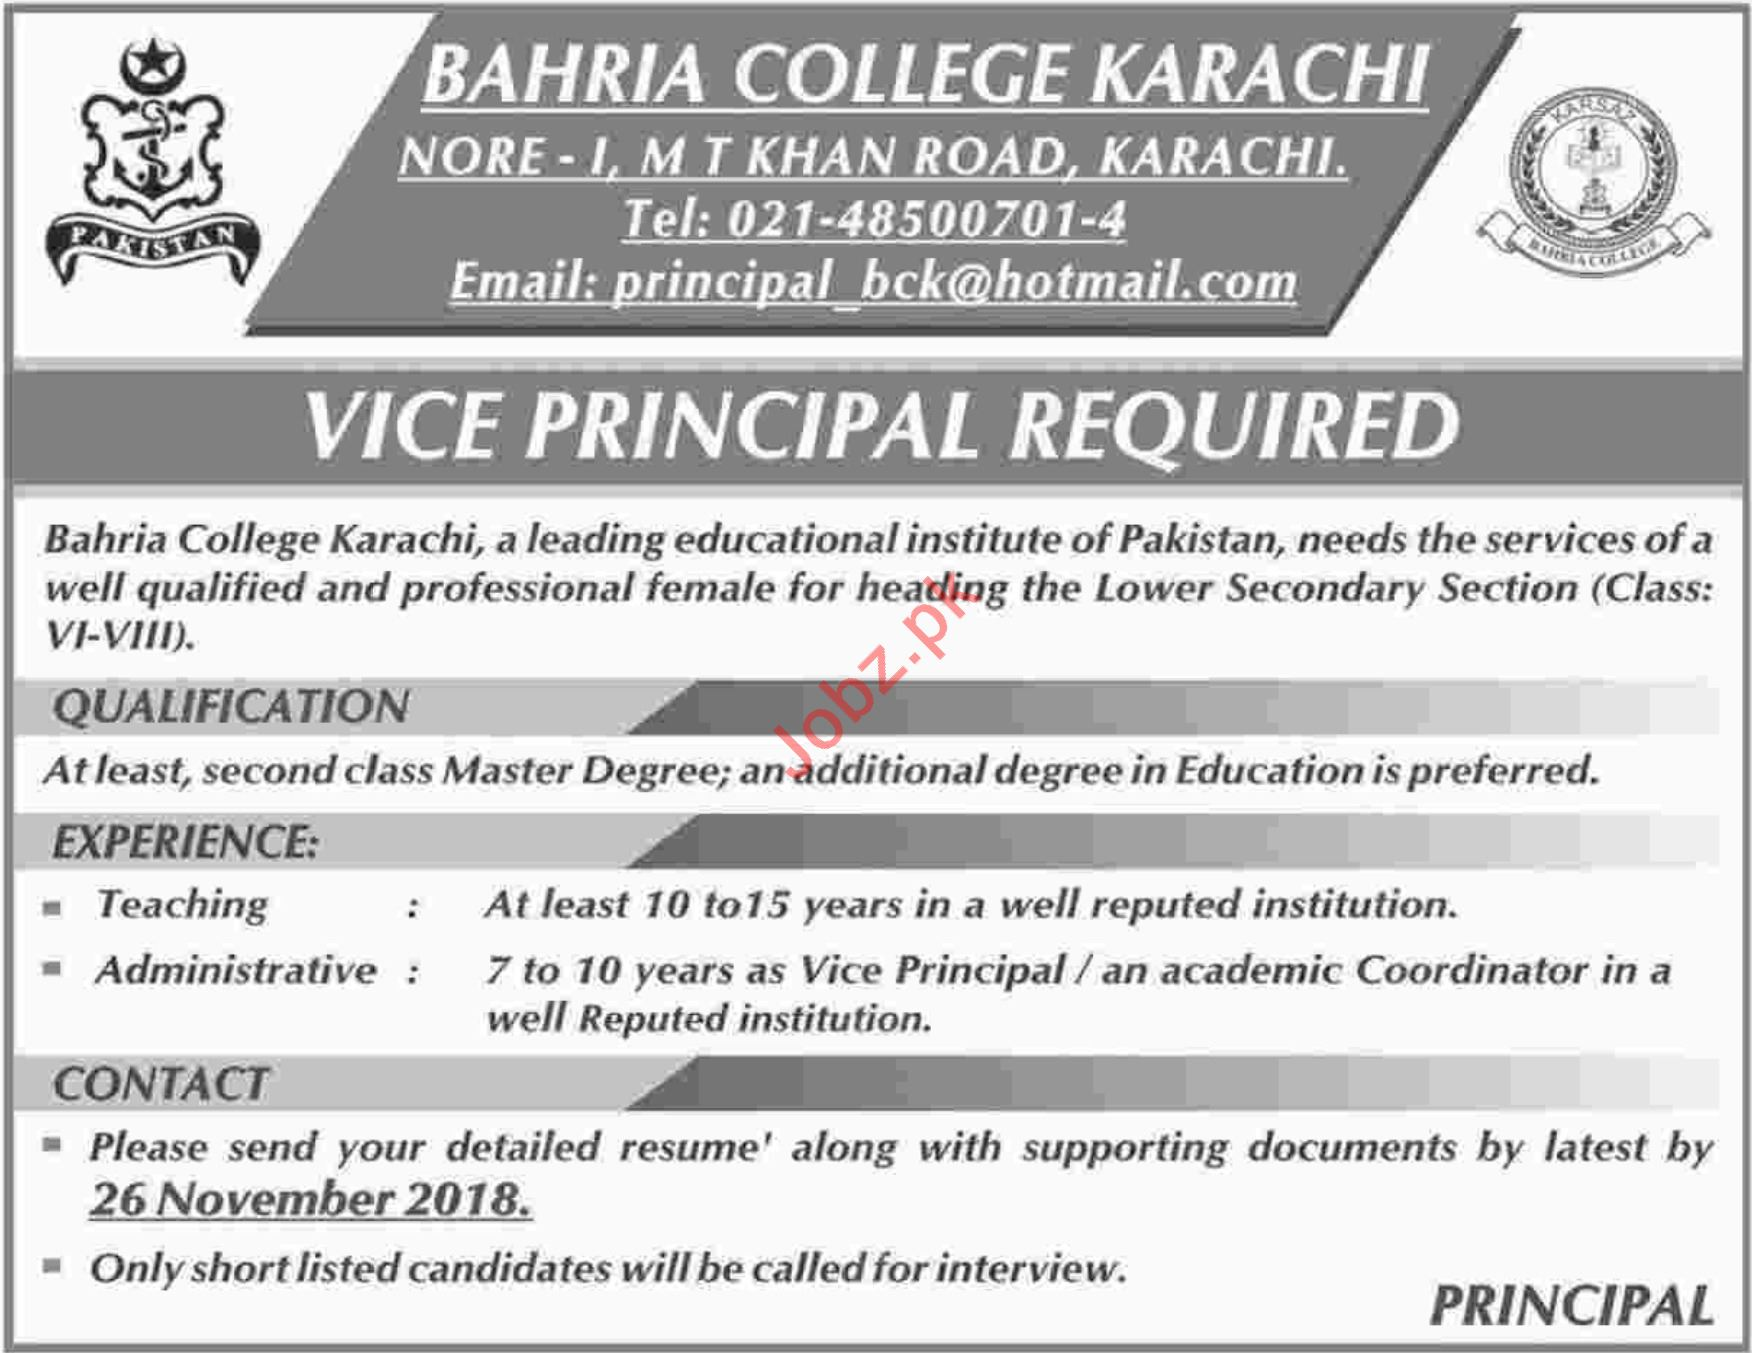 Bahria College Karachi Jobs 2018 for Vice Principal